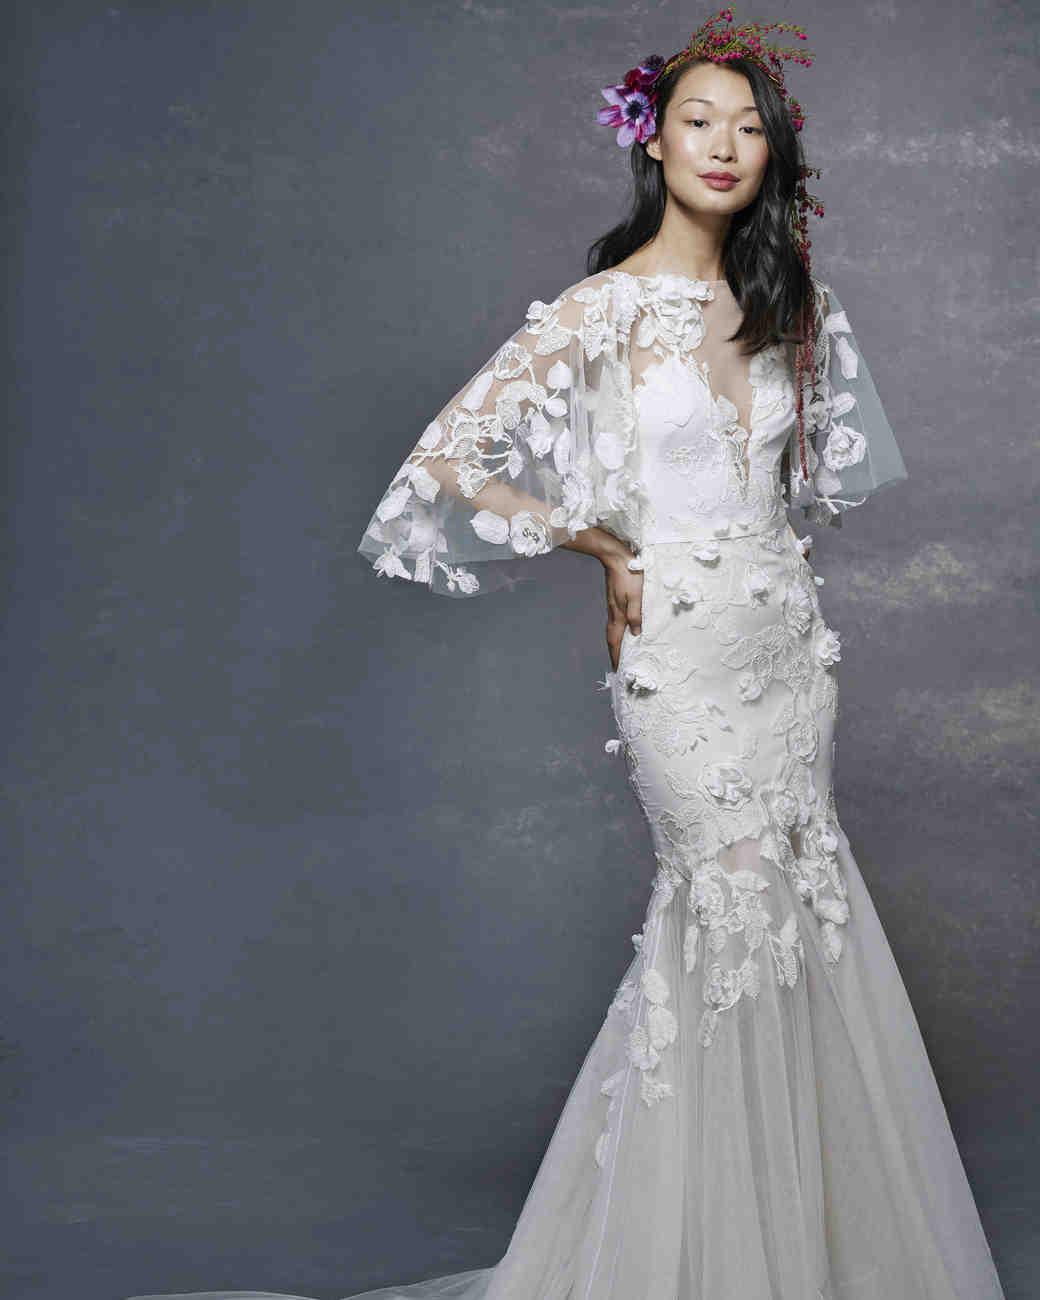 b57168ecffe9 Marchesa Notte Spring 2019 Wedding Dress Collection